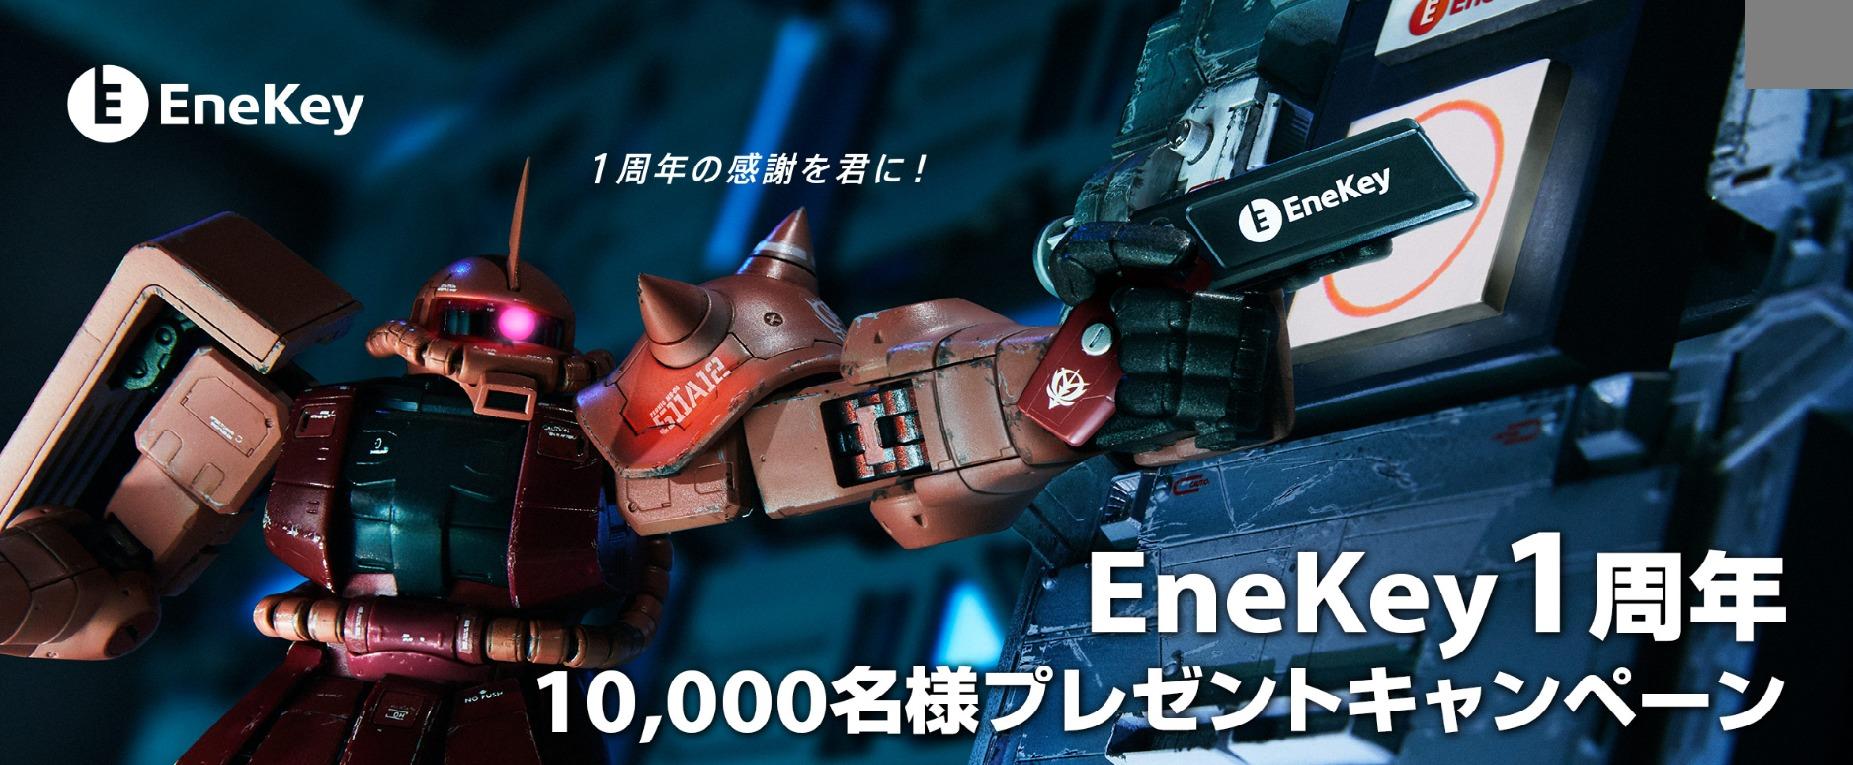 enekey-1st-anniversary-campaign